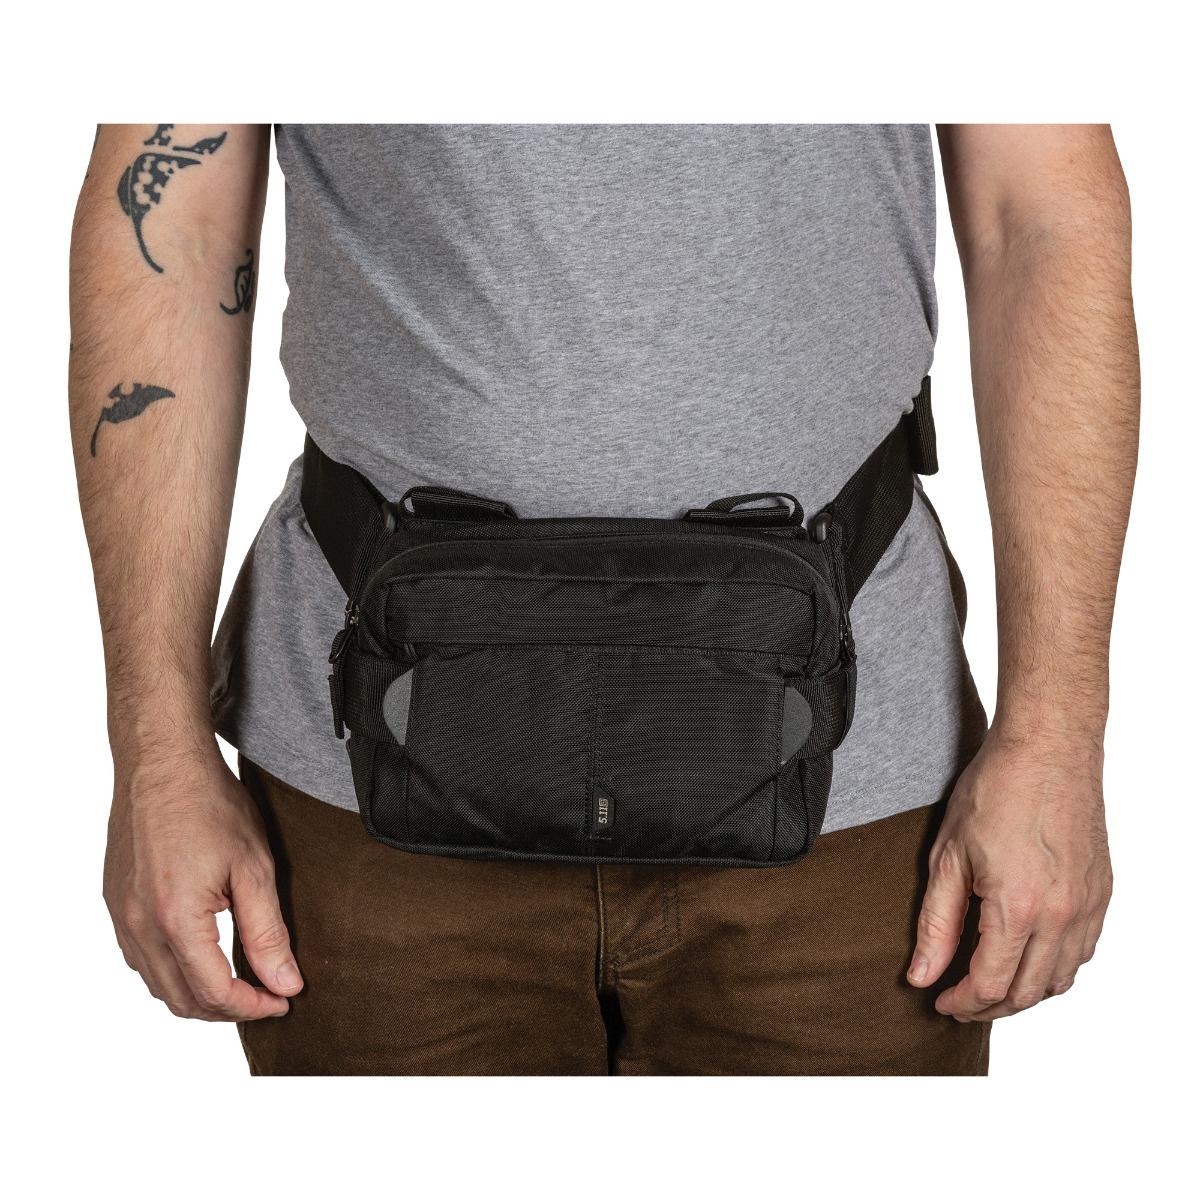 5.11 LV6 waist pack